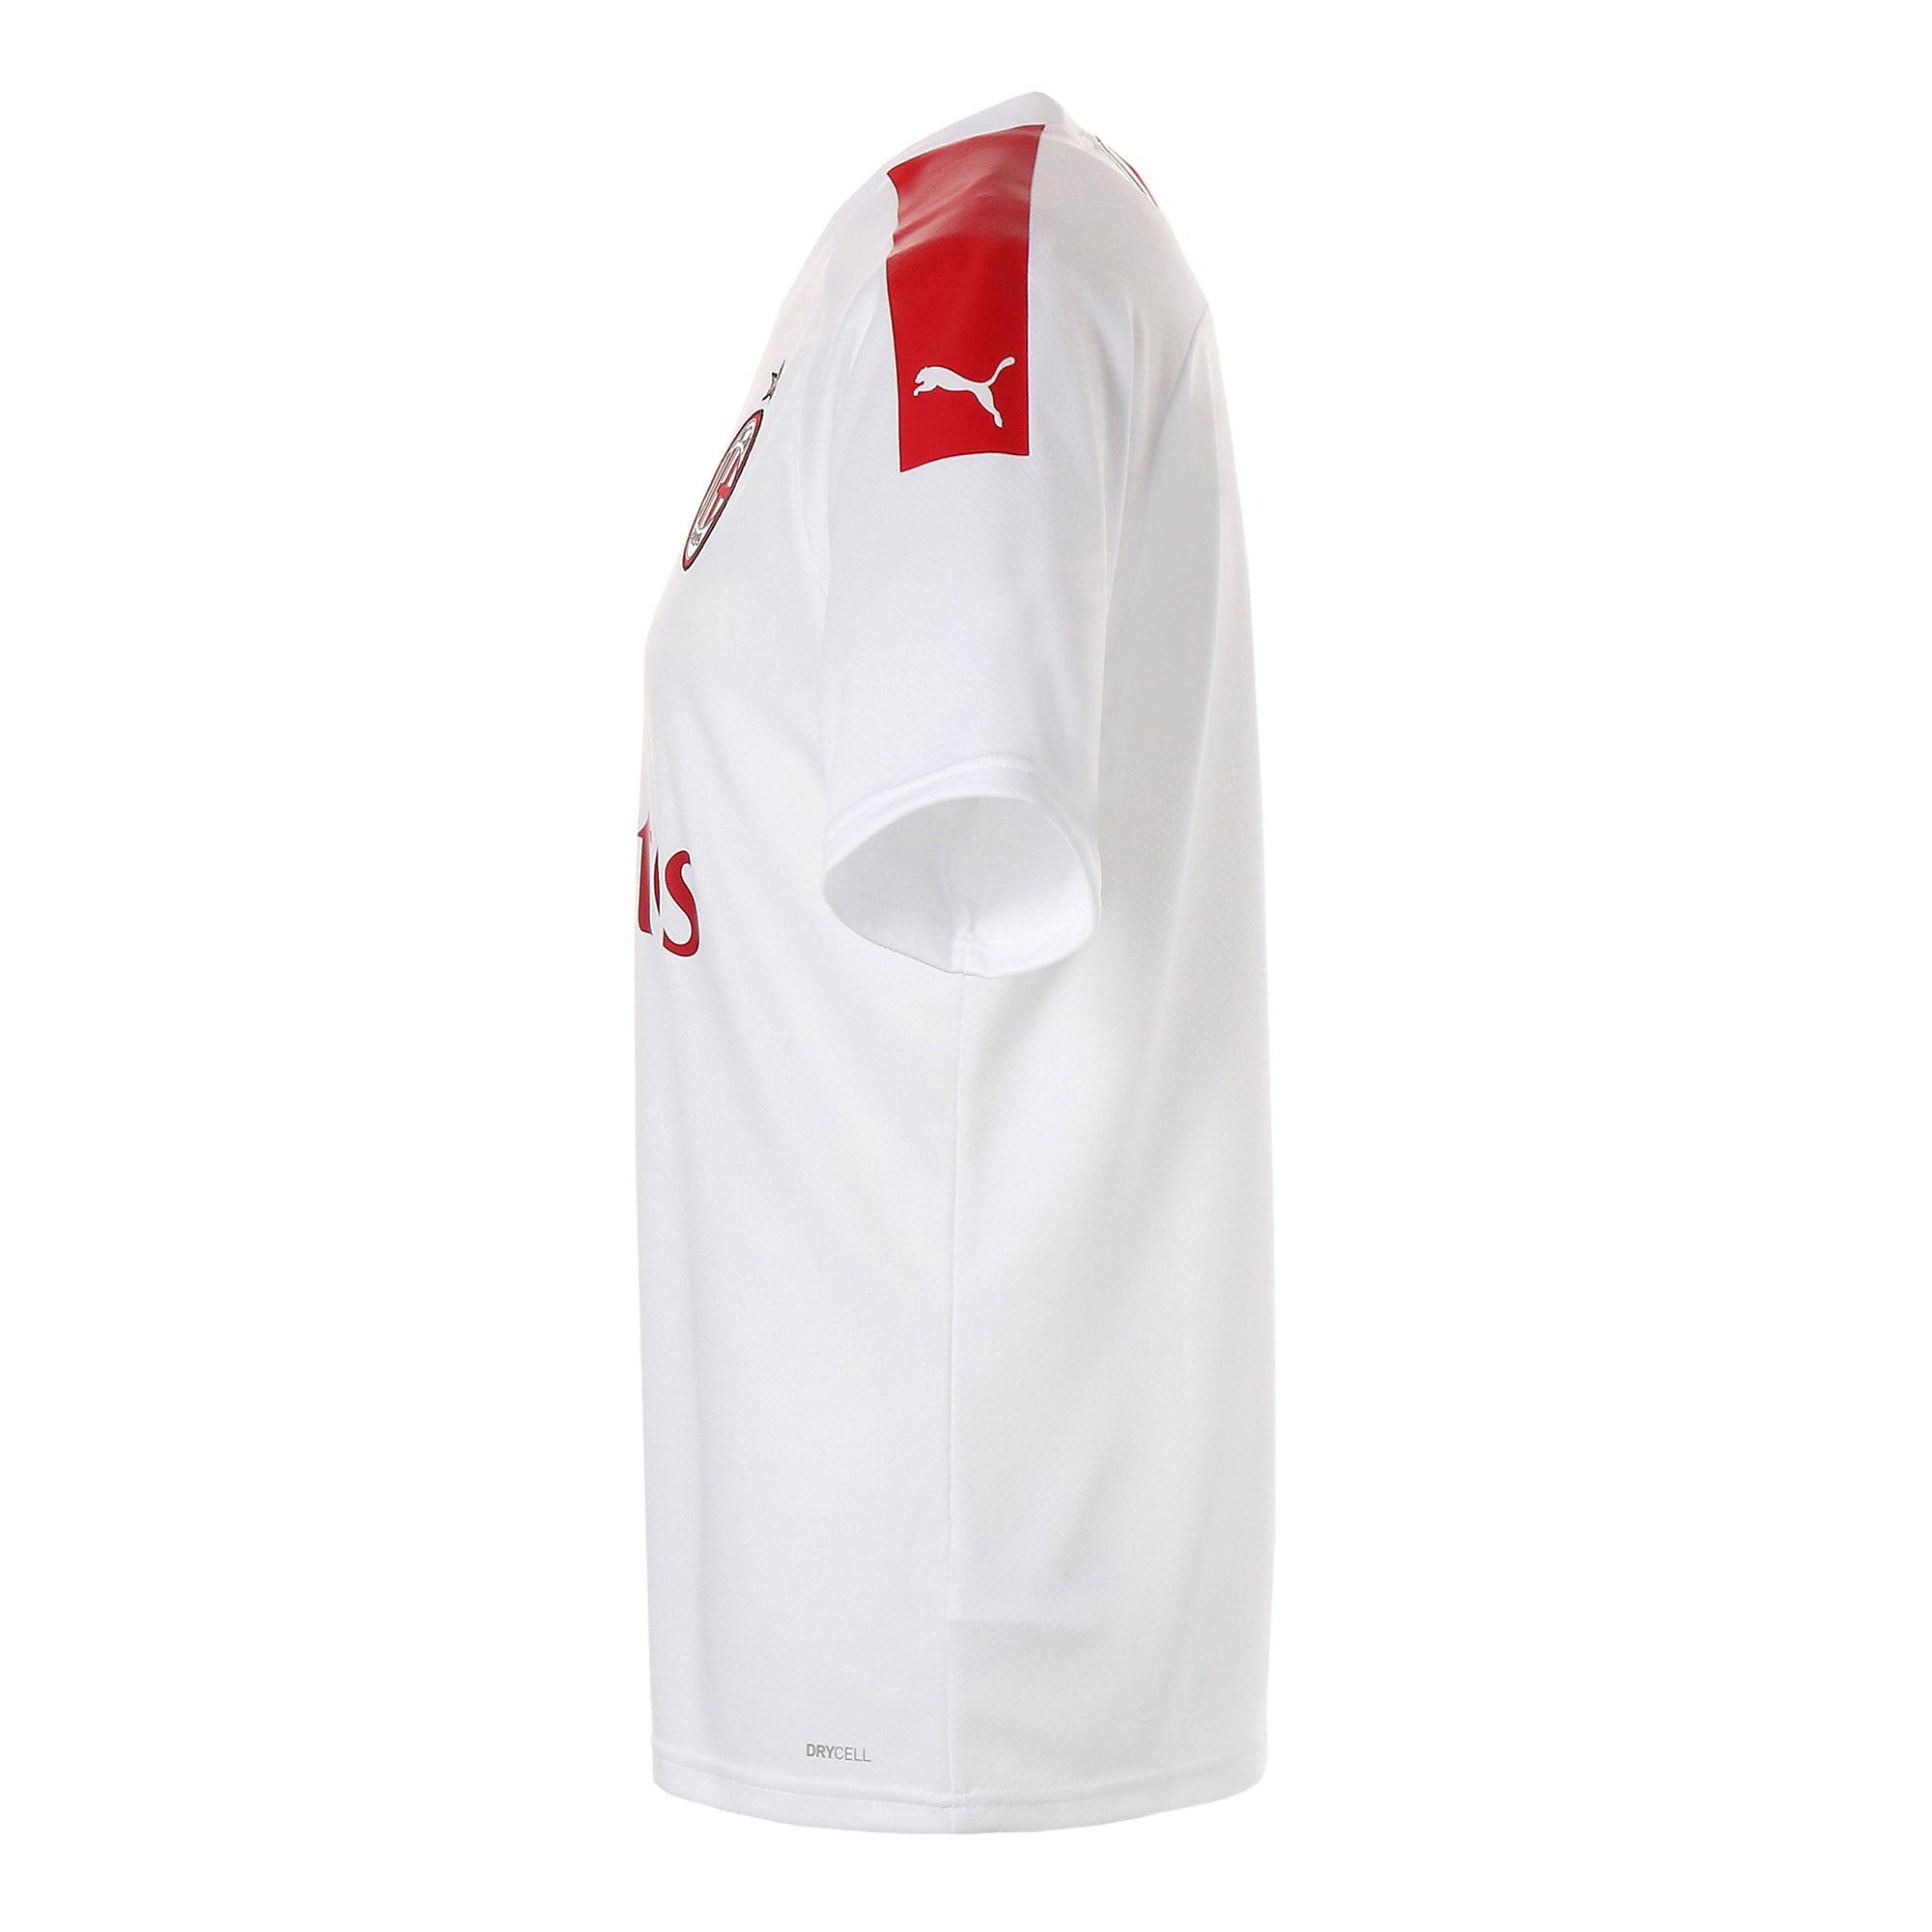 Thumbnail 2 of ACミラン ACM SS アウェイ レプリカシャツ 半袖, Puma White-Tango Red, medium-JPN